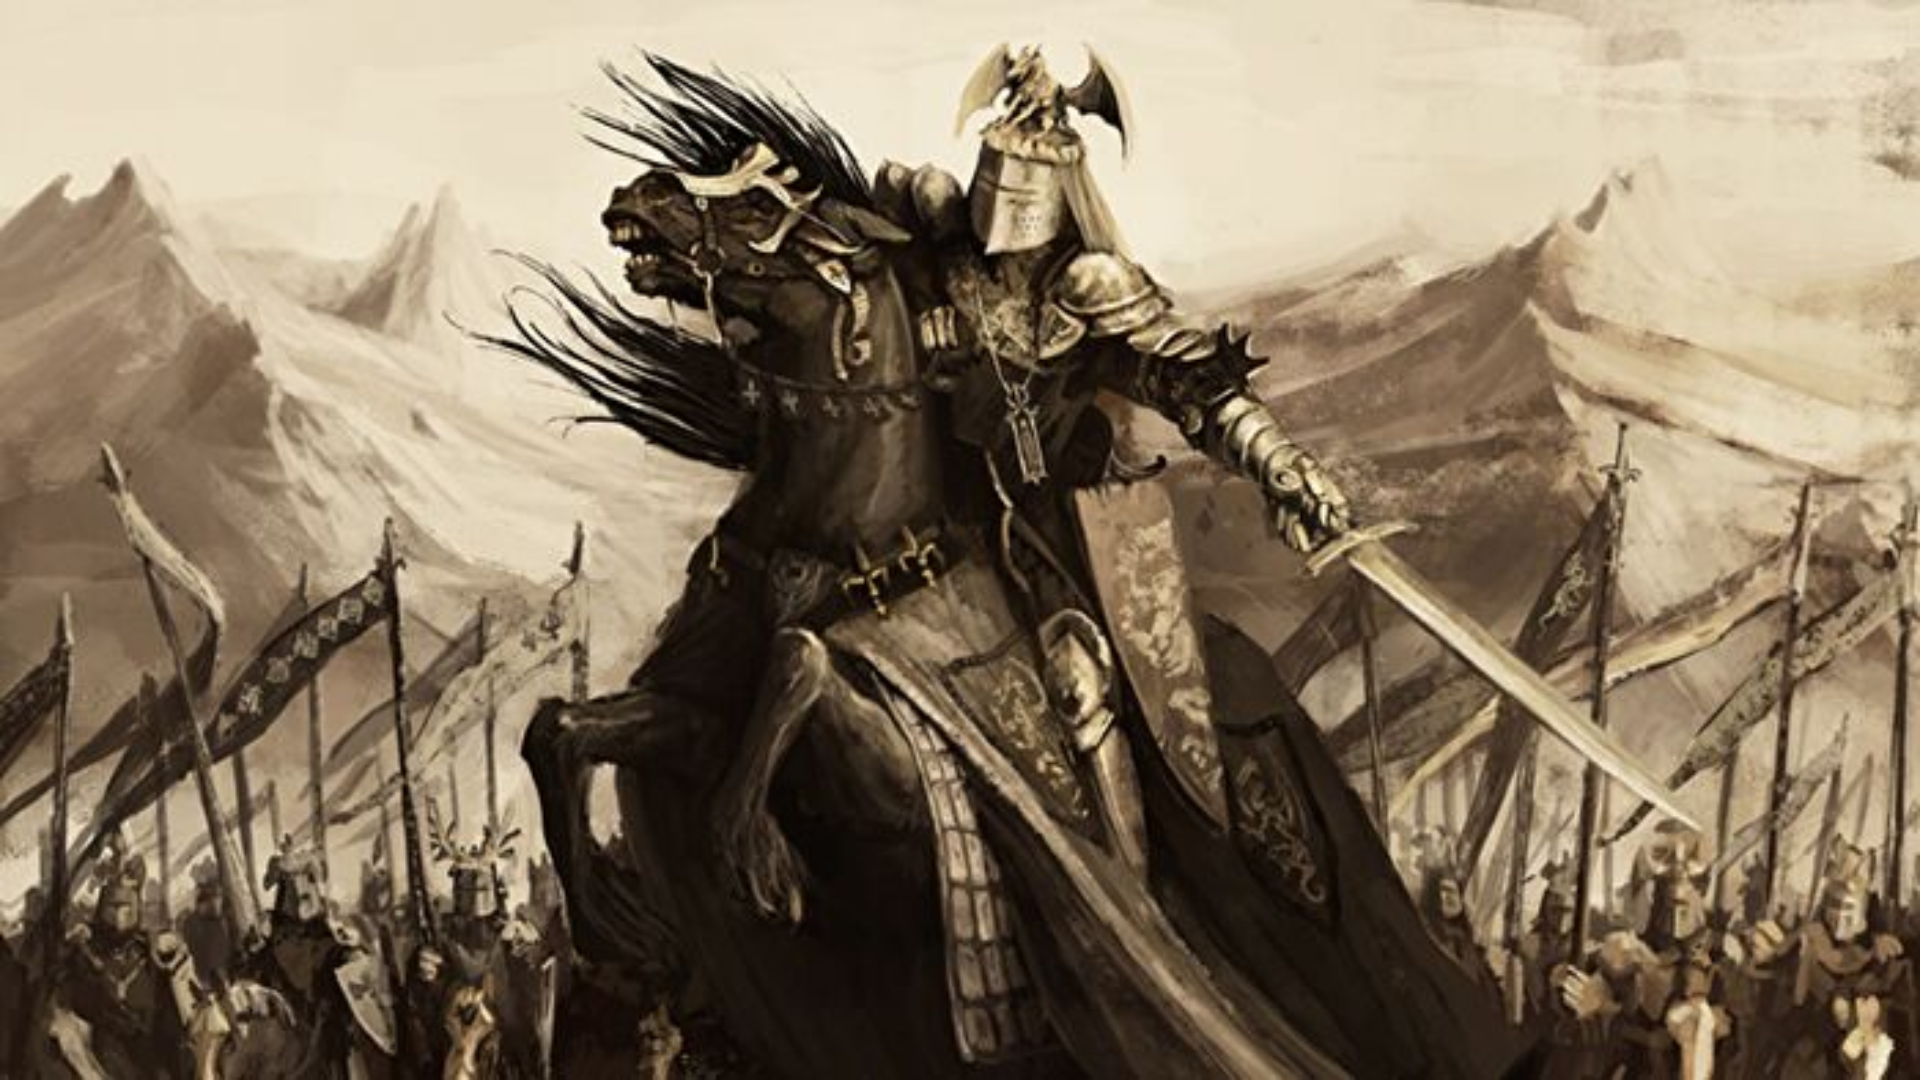 King Arthur Pendragon Arthurian myth tabletop RPG game